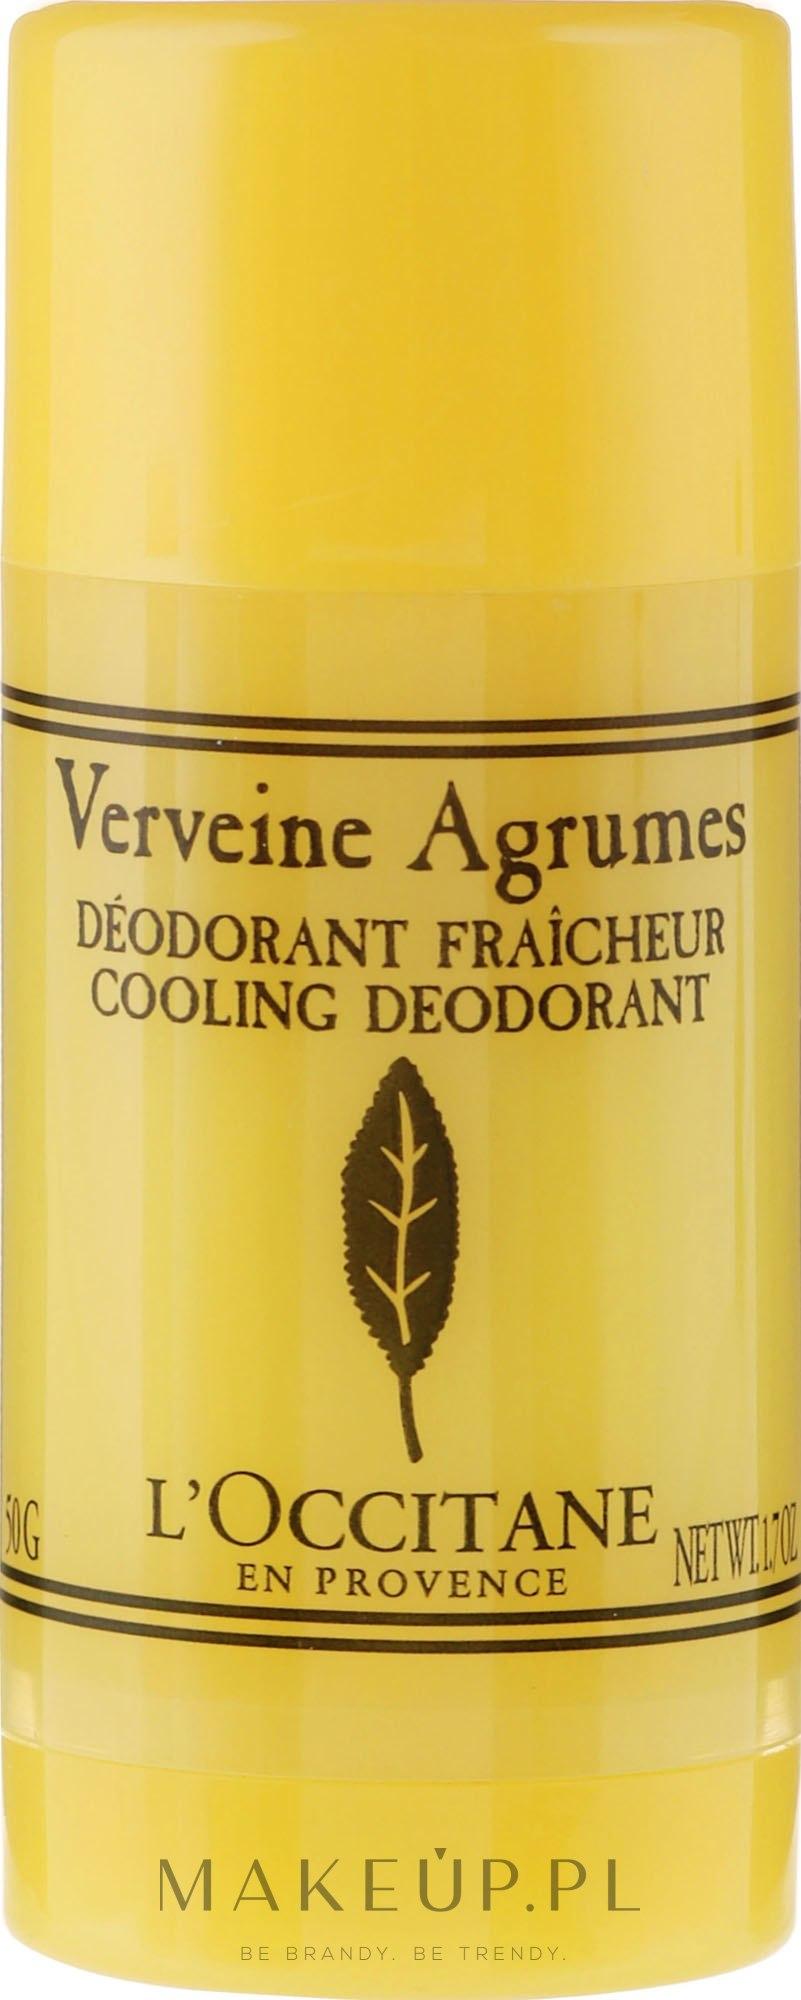 Dezodorant w sztyfcie Cytrusowa werbena - L'Occitane Verbena Cooling Deodorant Stick — фото 50 g